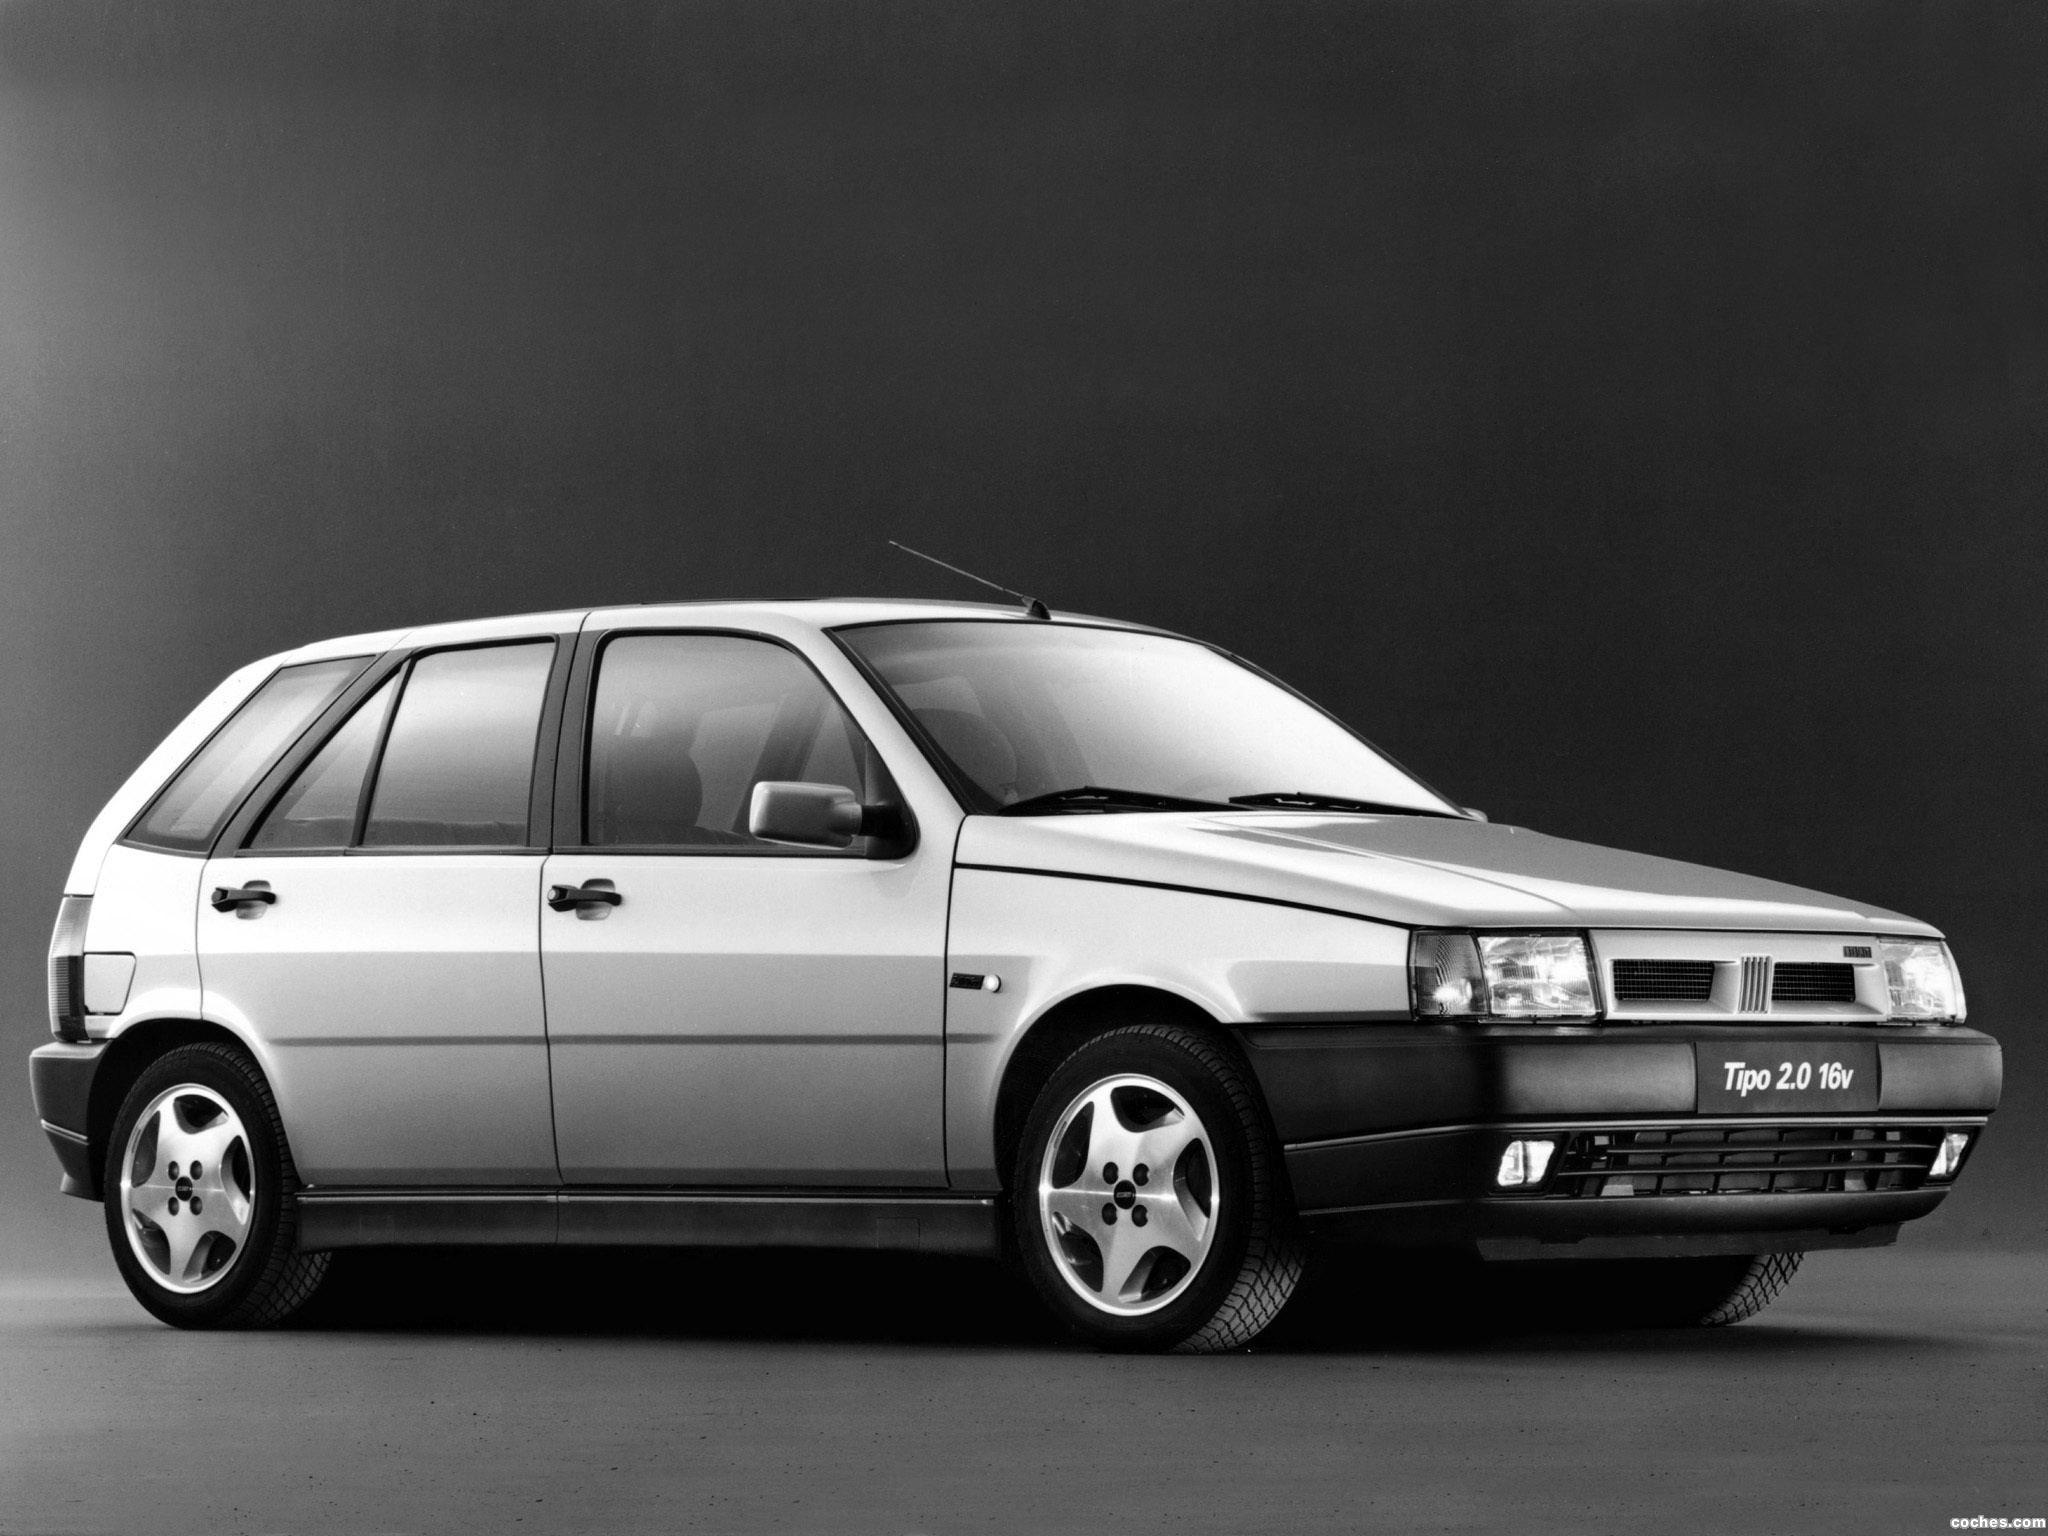 Foto 0 de Fiat Tipo 2.0 i.e. 16V 1991